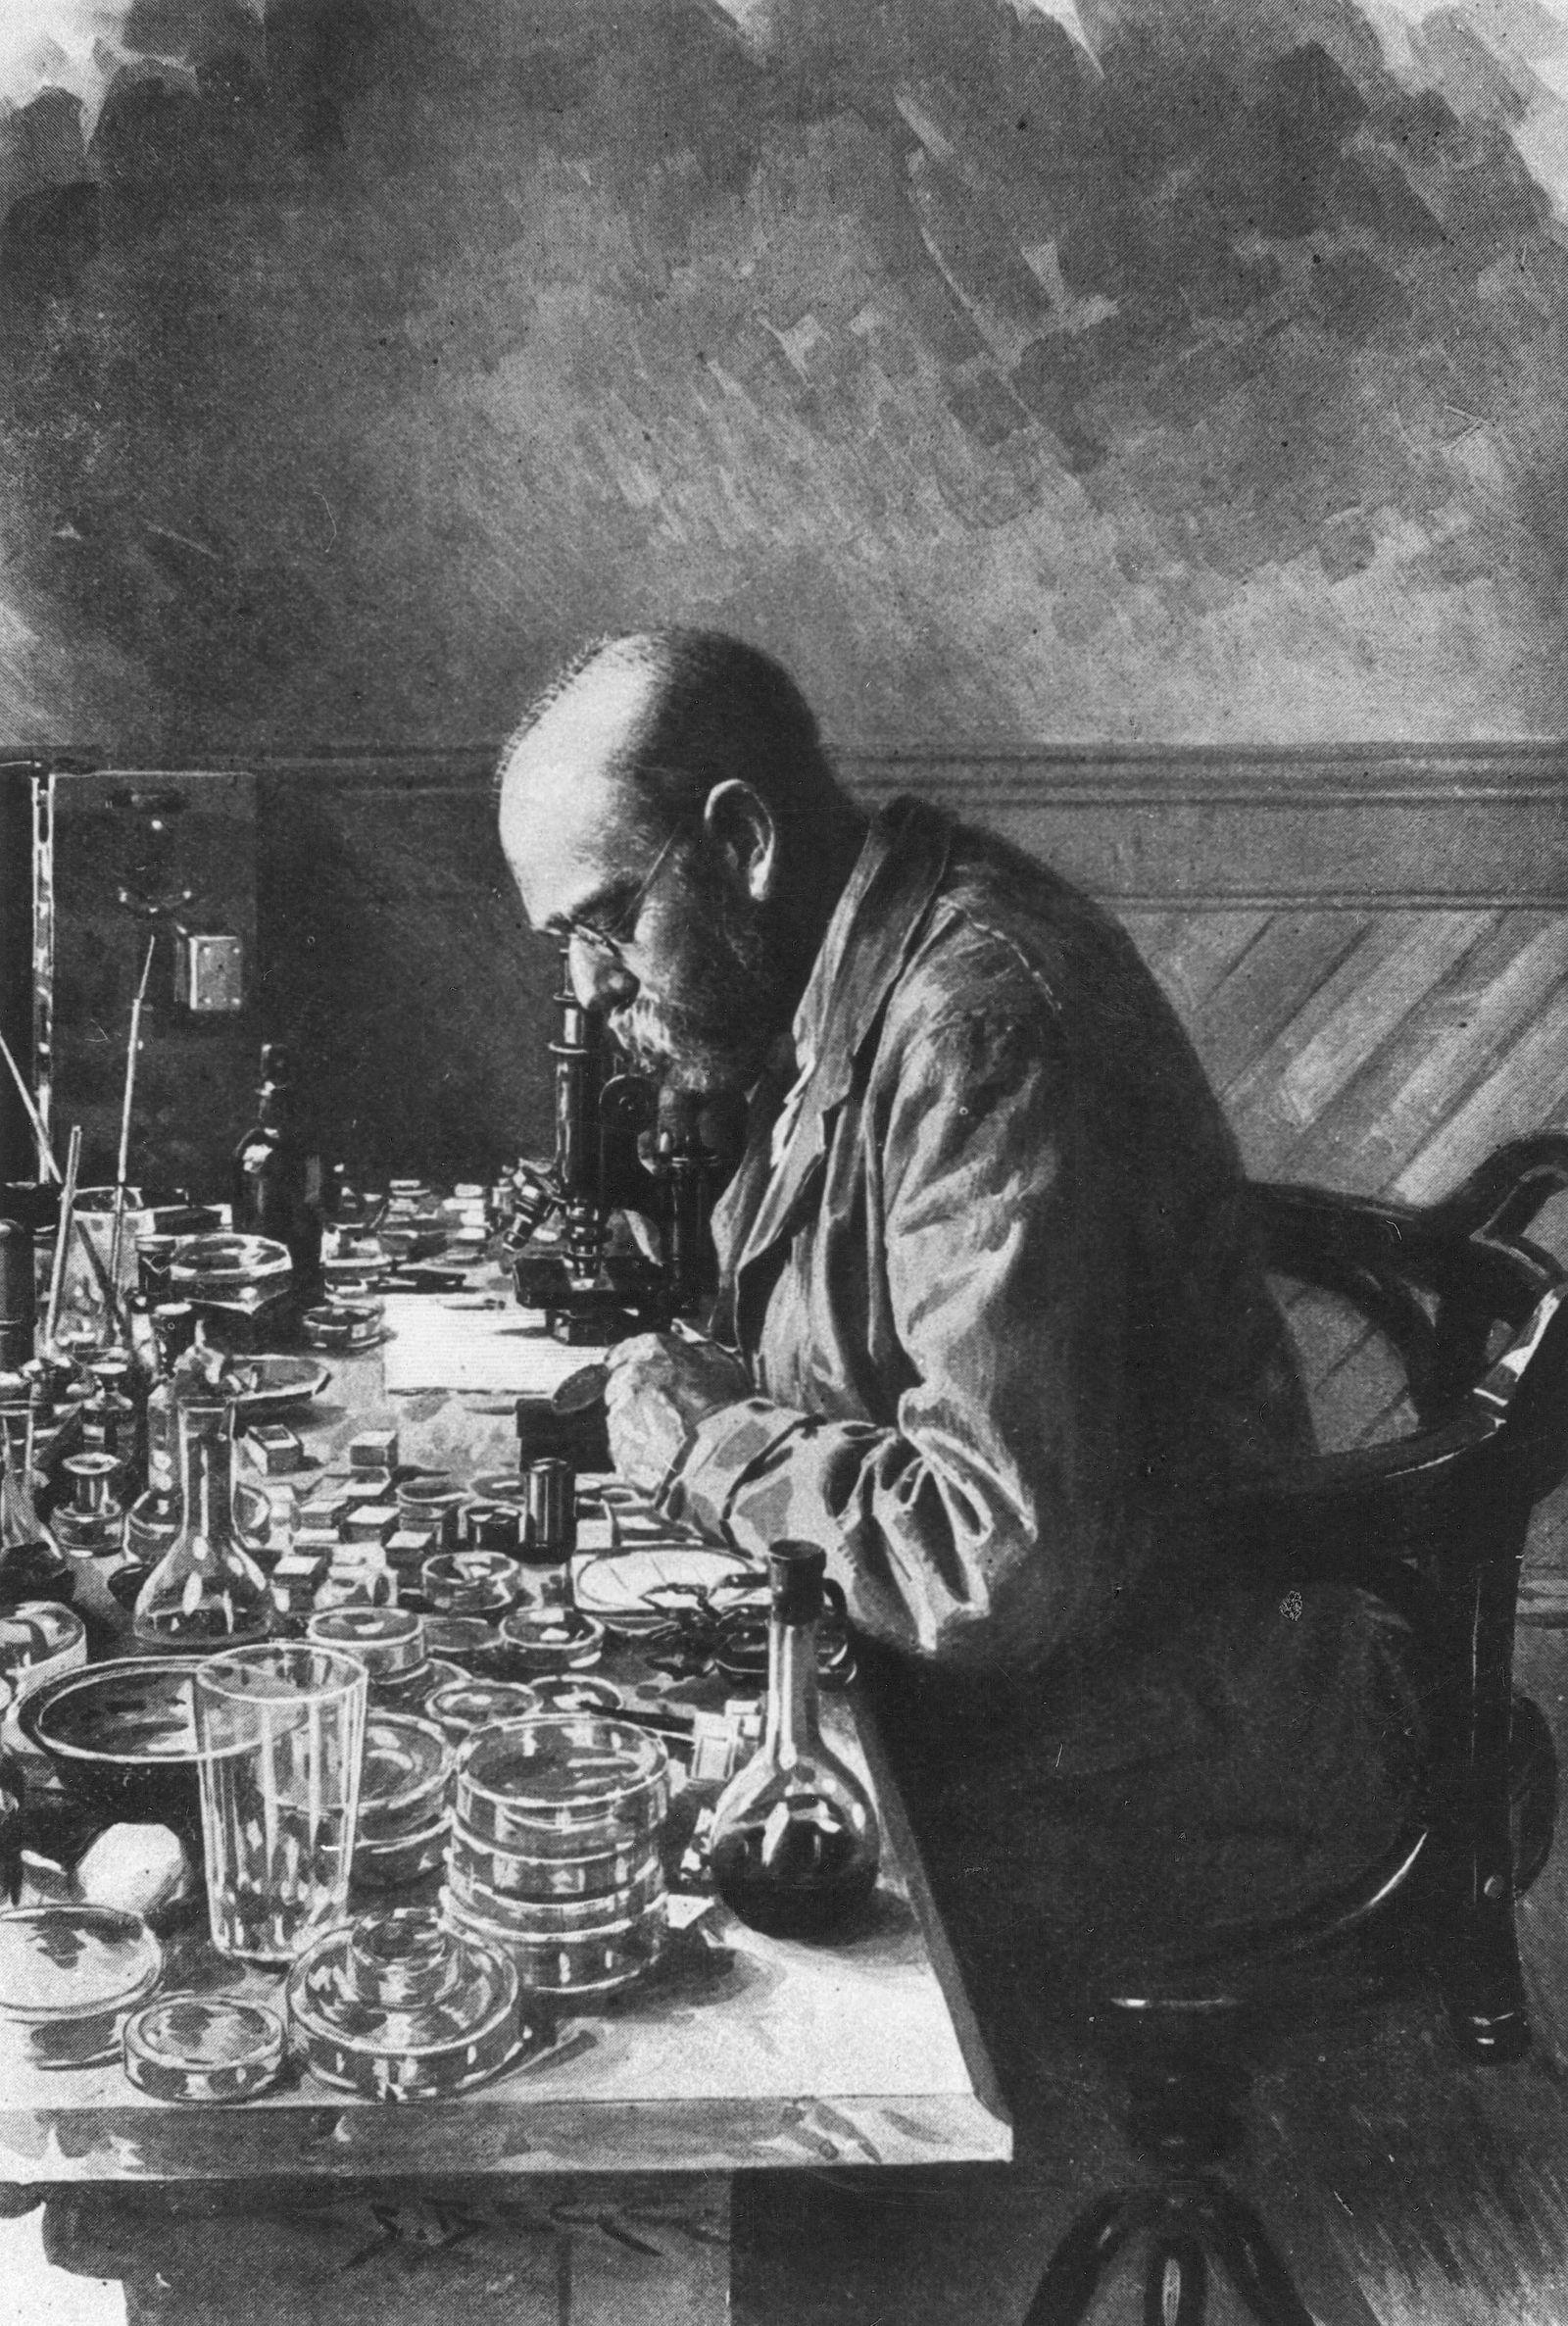 ROBERT KOCH (1843-1910). German physician and bacteriologist. Drawing, 1897.